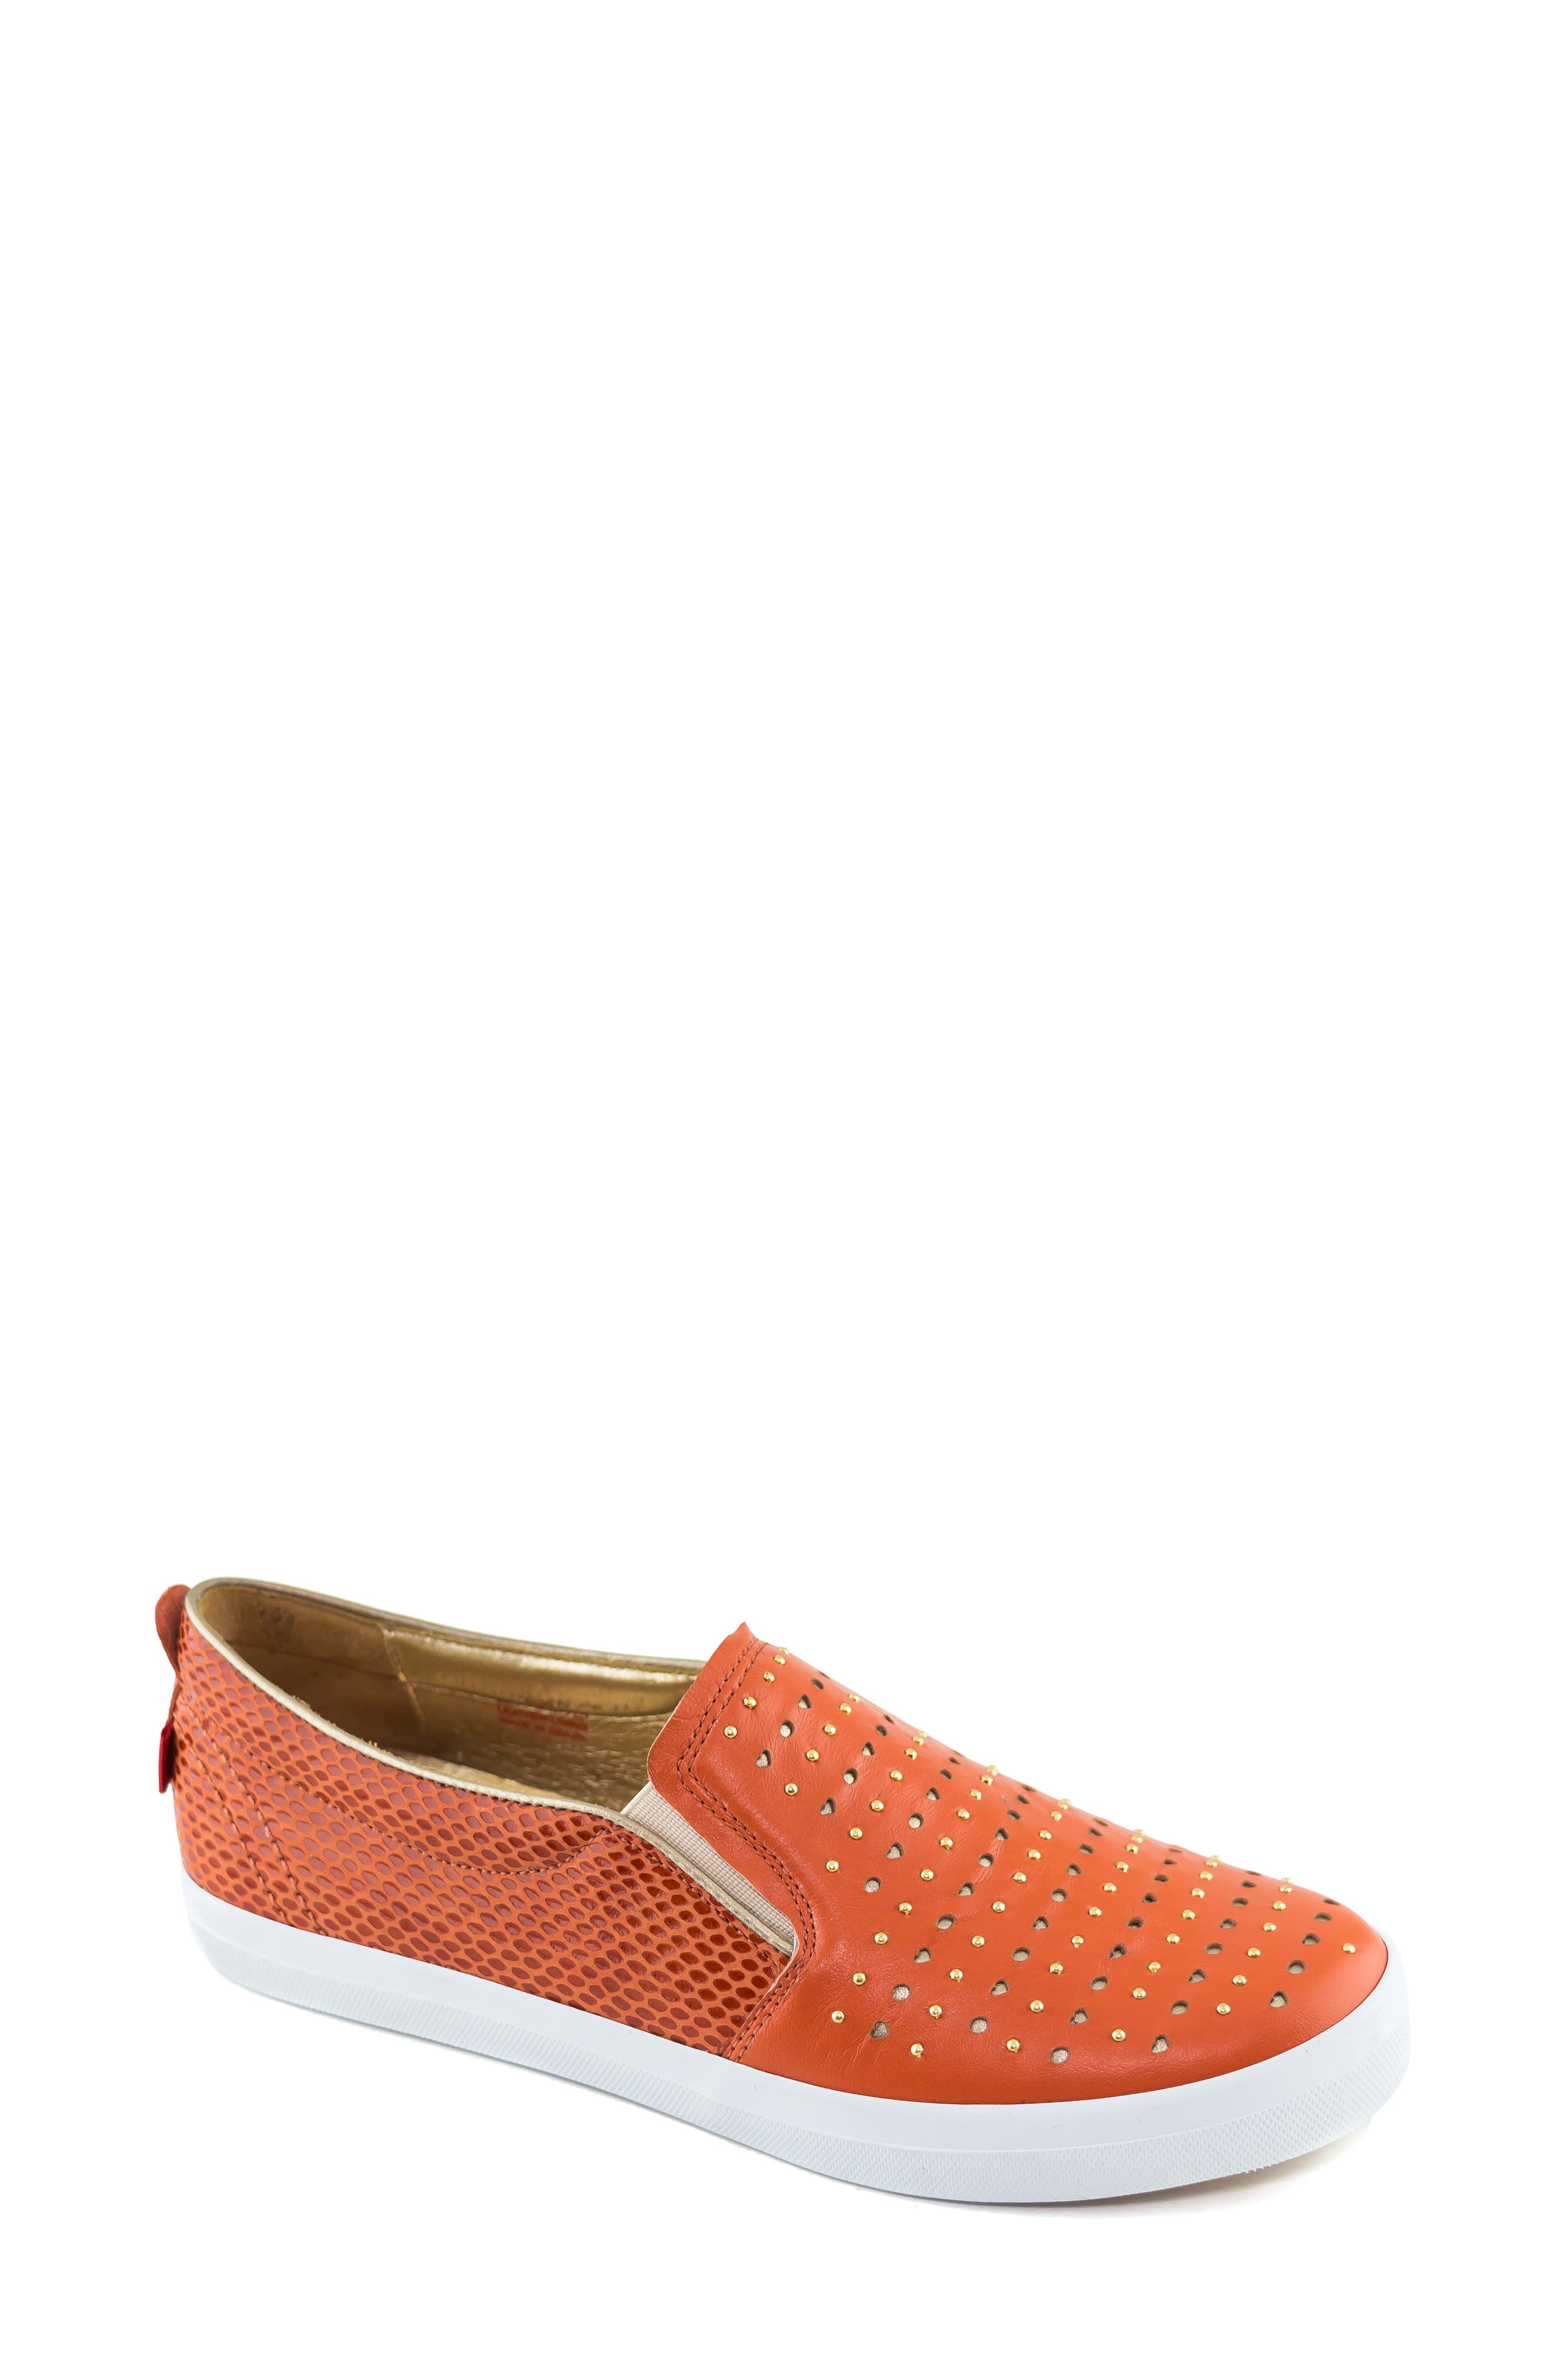 Marc Joseph New York Soho Sneaker- Coral